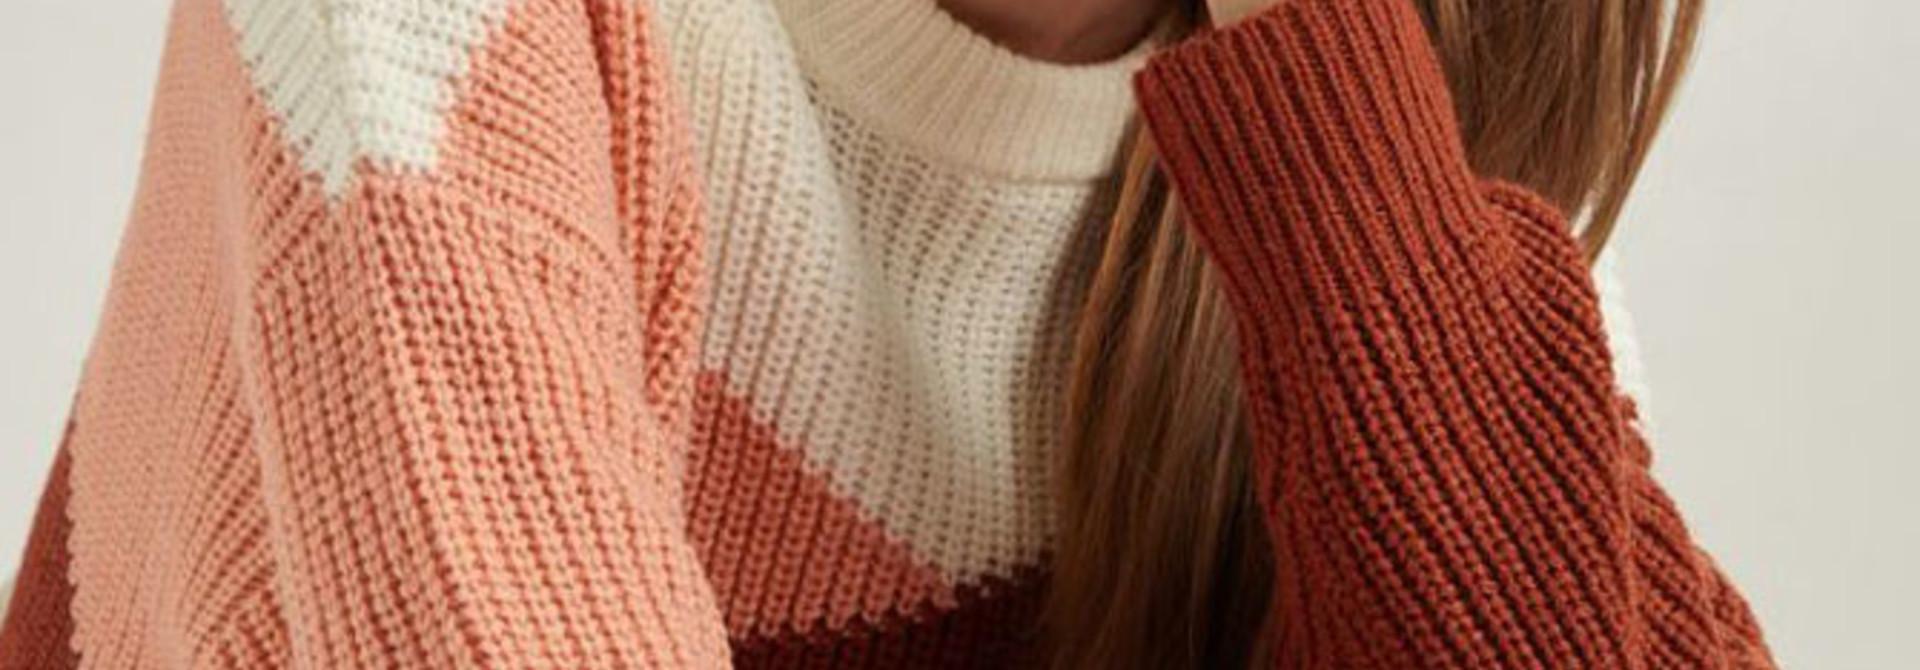 Graffëa knitted sweater Rust